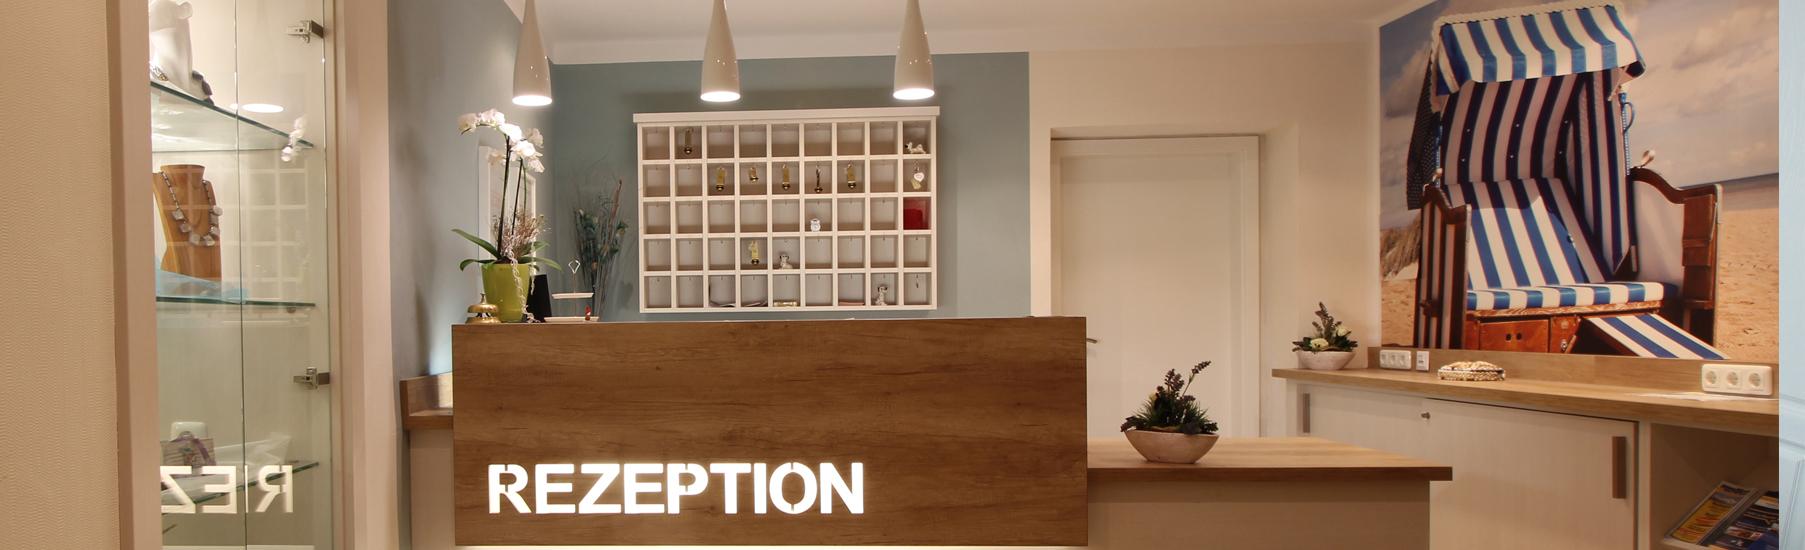 rezeption-slide2